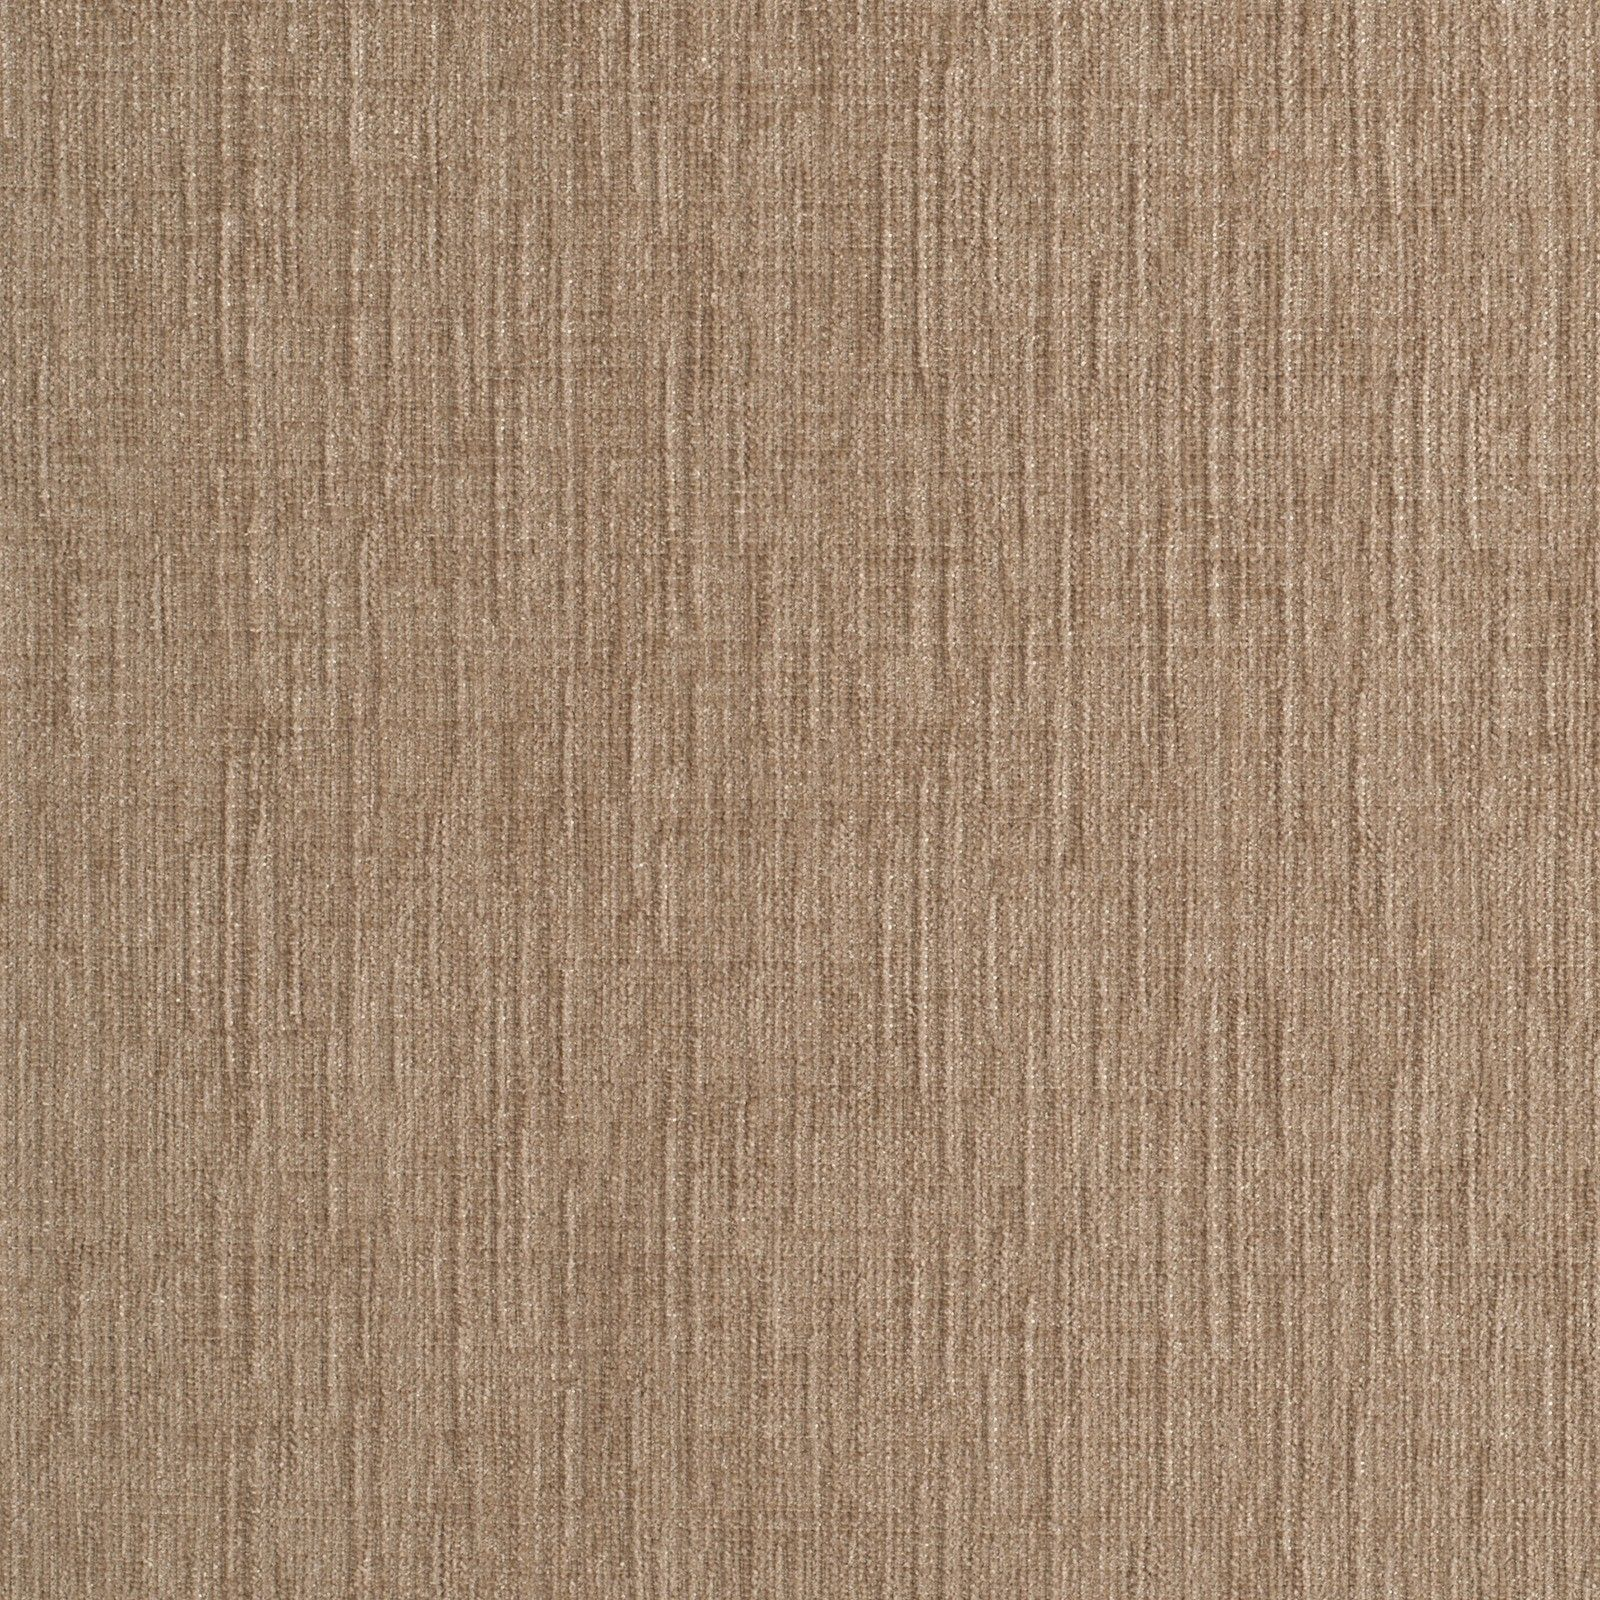 ANICHINI Fabrics   Custom Linen Velvet Sage Contract Fabric - a green linen velvet fabric